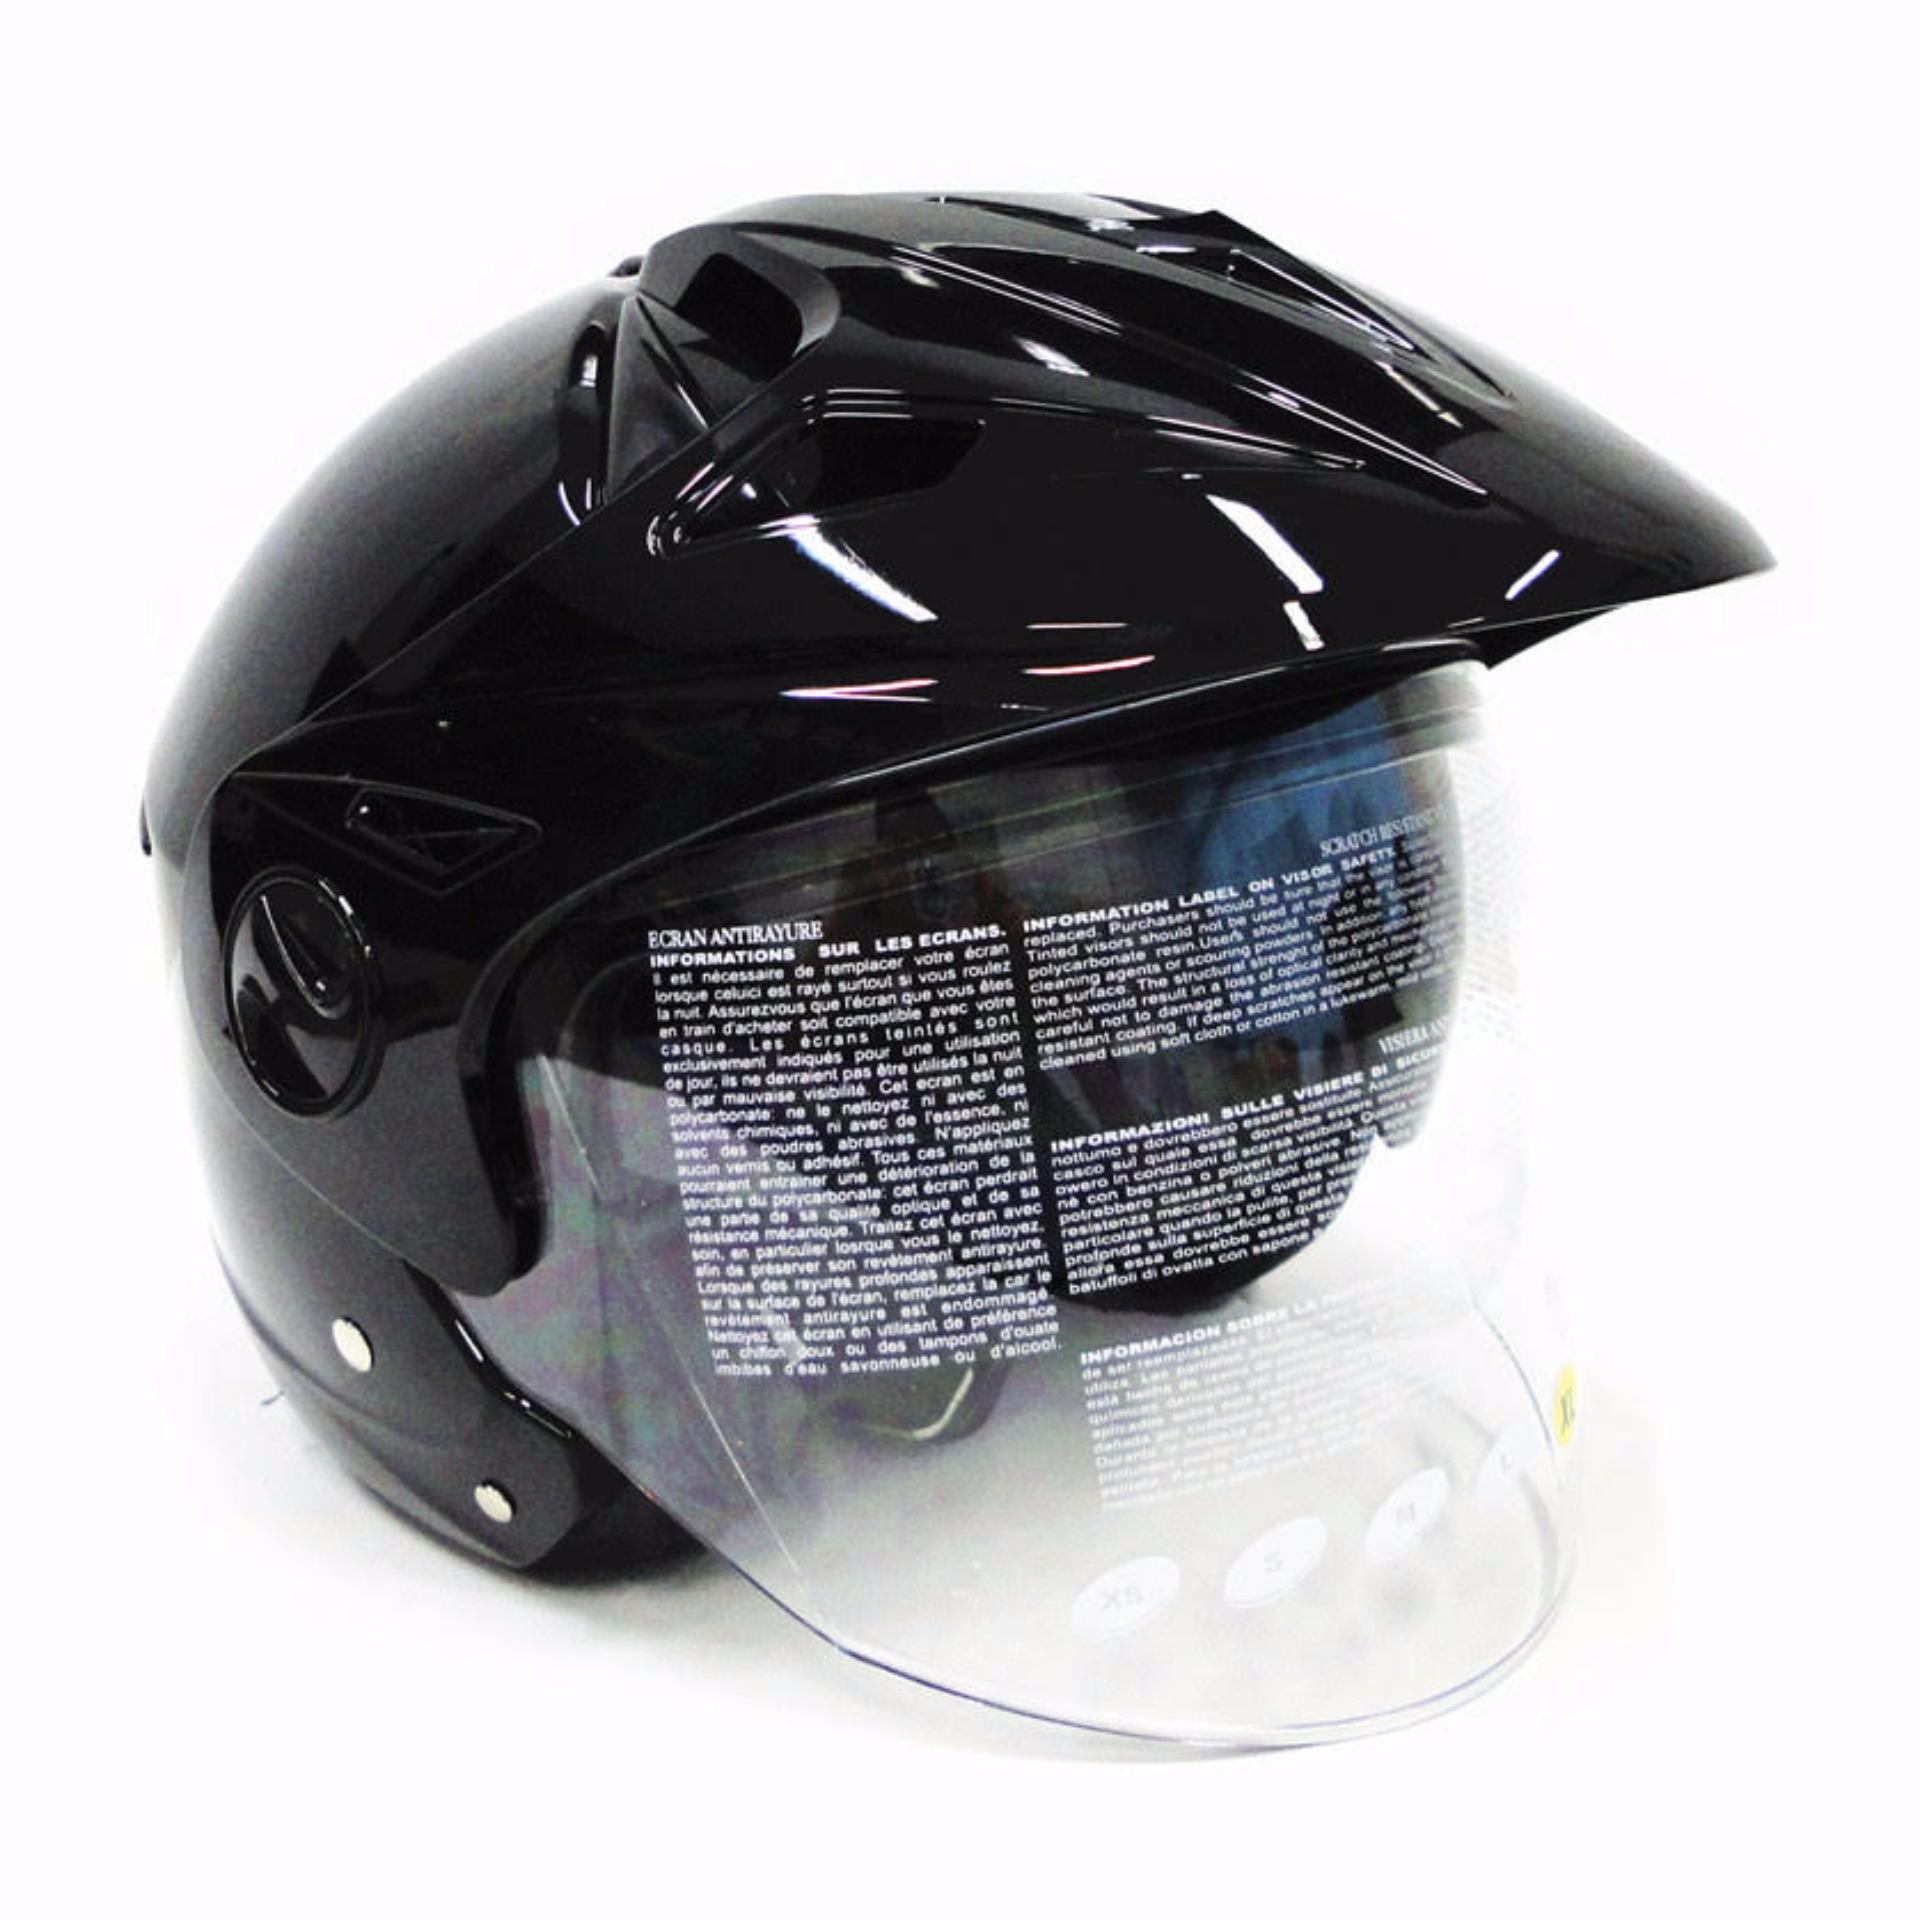 Zeus Helm Half Face Retro Zs 210k Whitedd36 Black Grafik Daftar 218 Iron Head Putih Ss6 Hitam Double Visor 612c